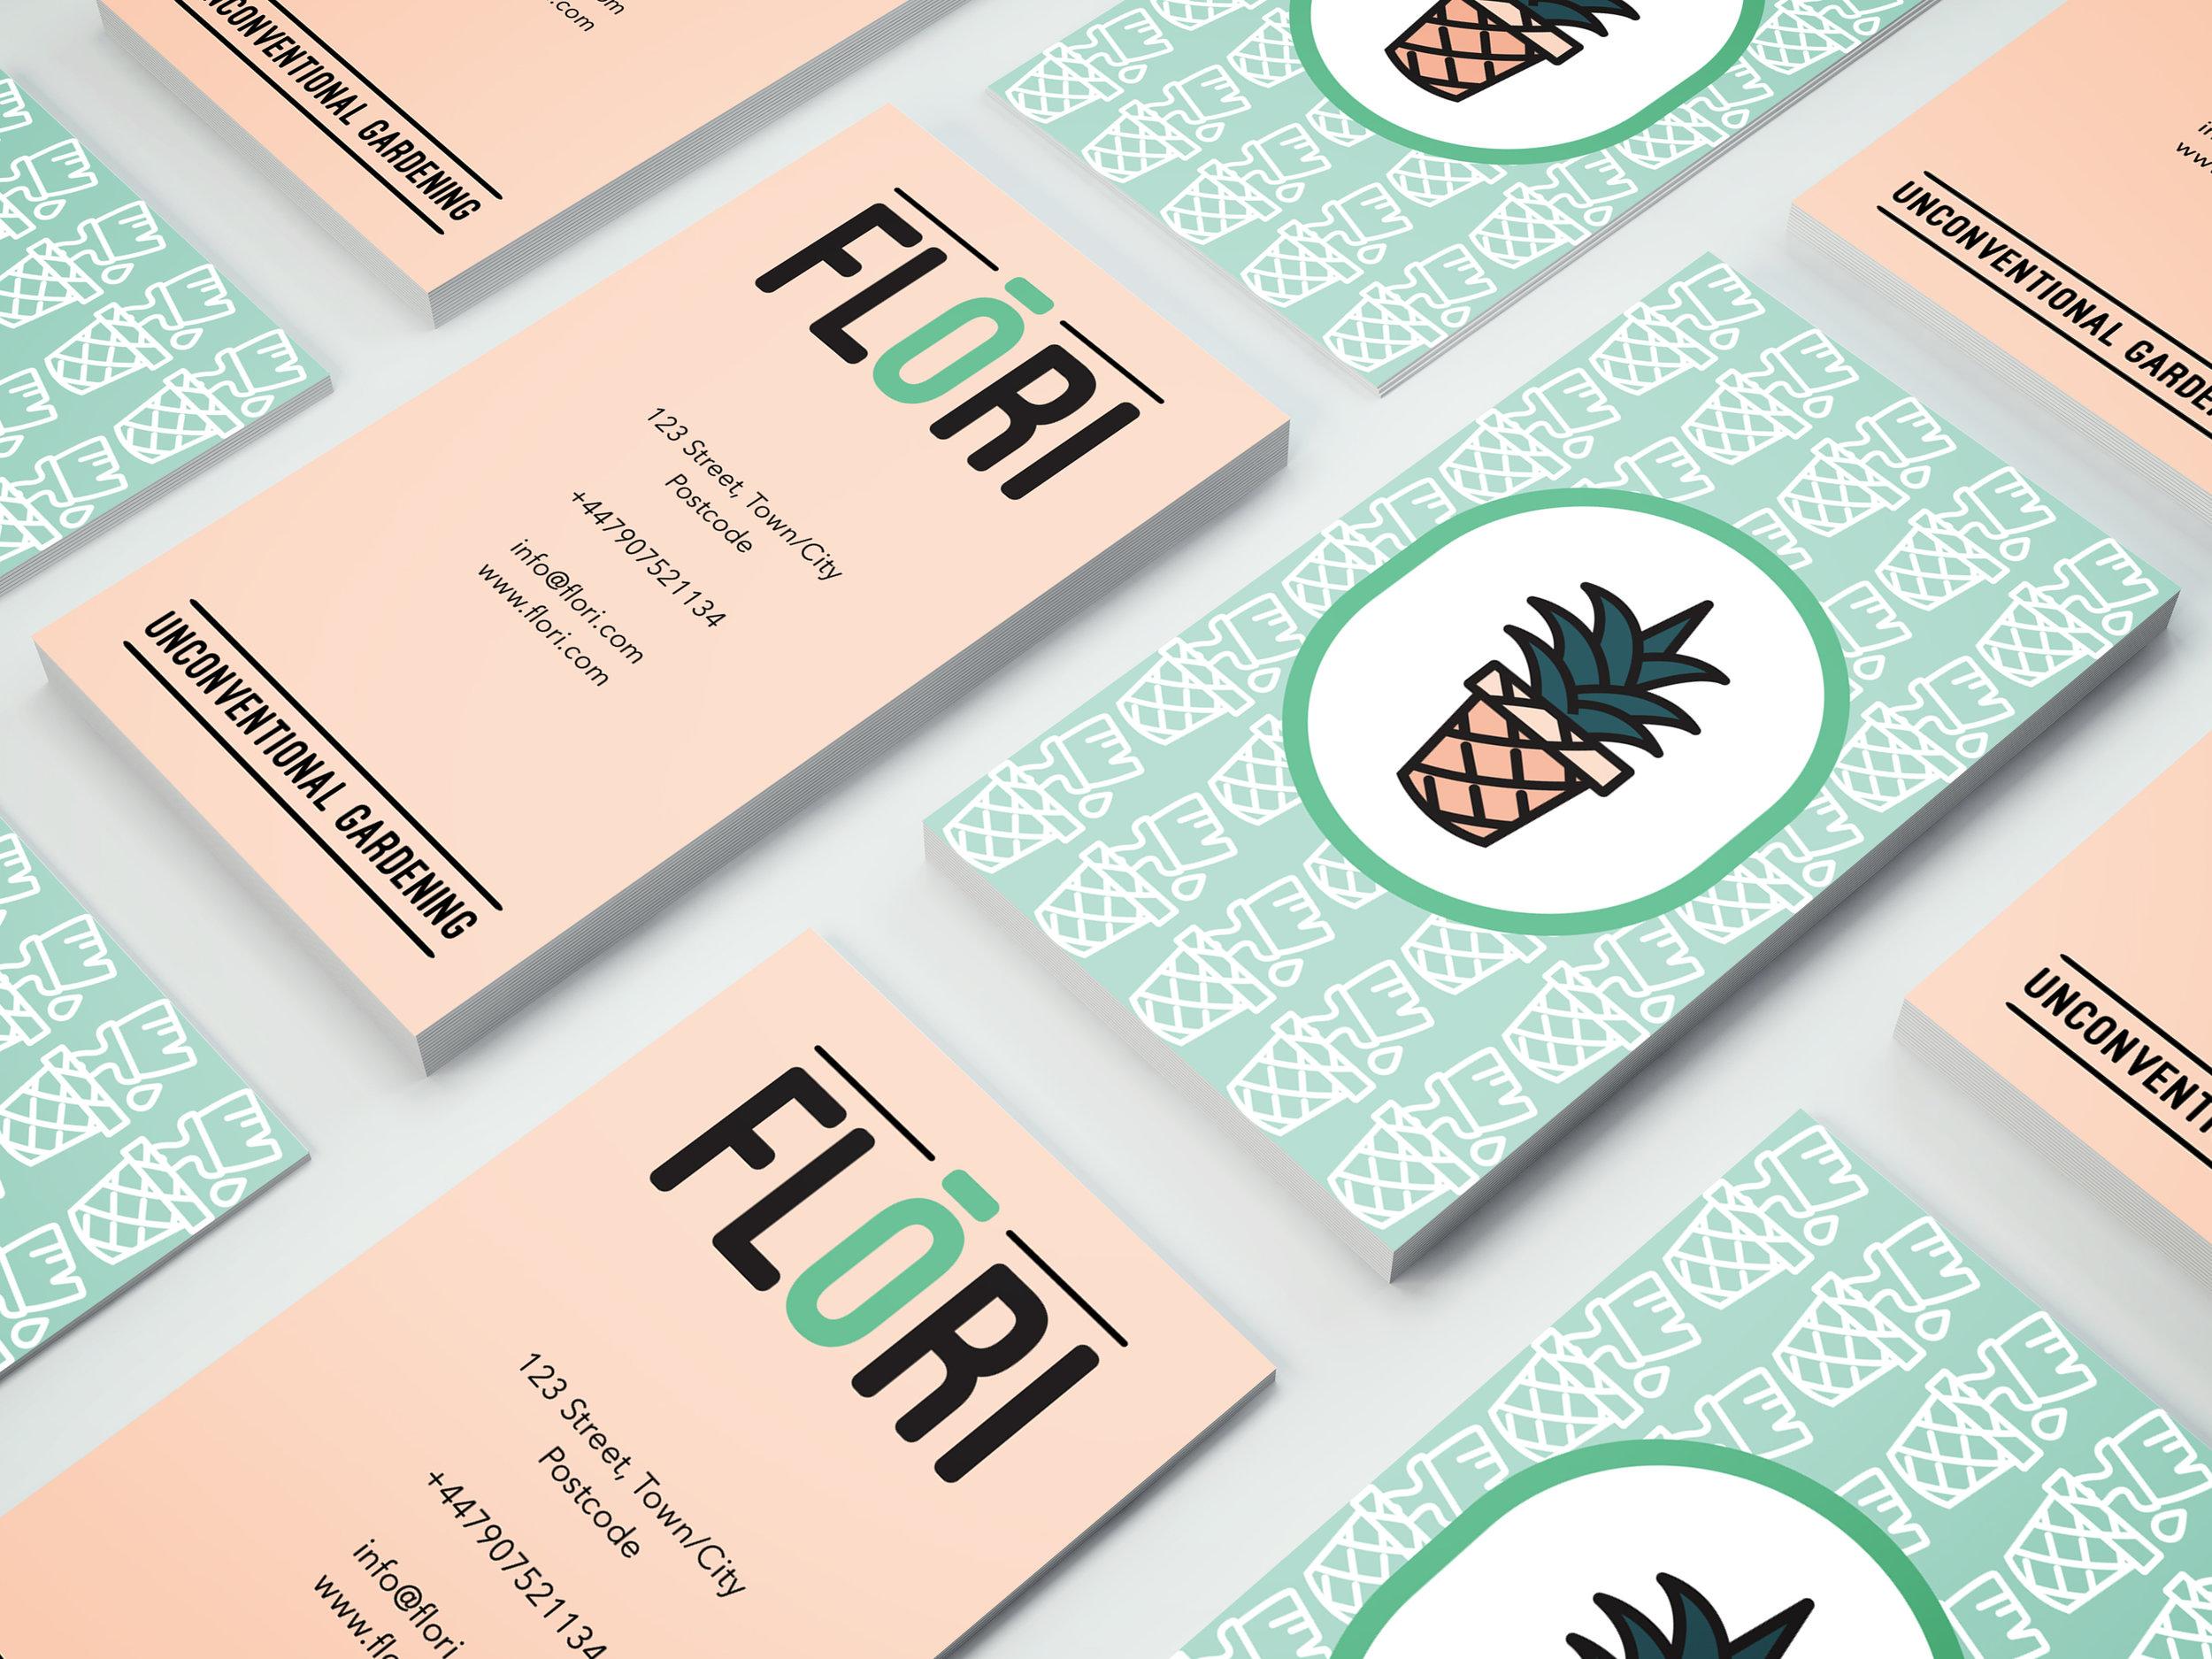 Flori Business Cards3.jpg